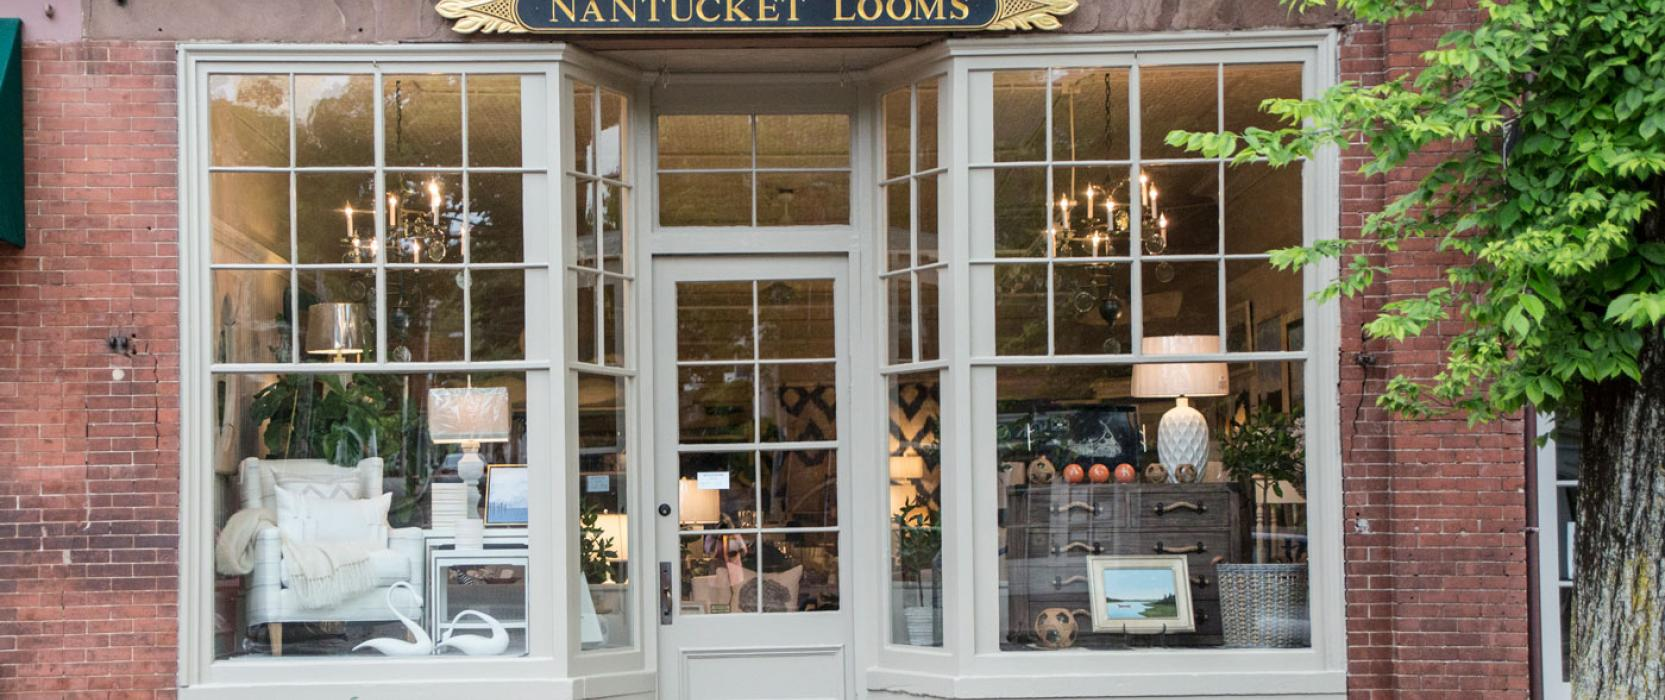 Nantucket Looms